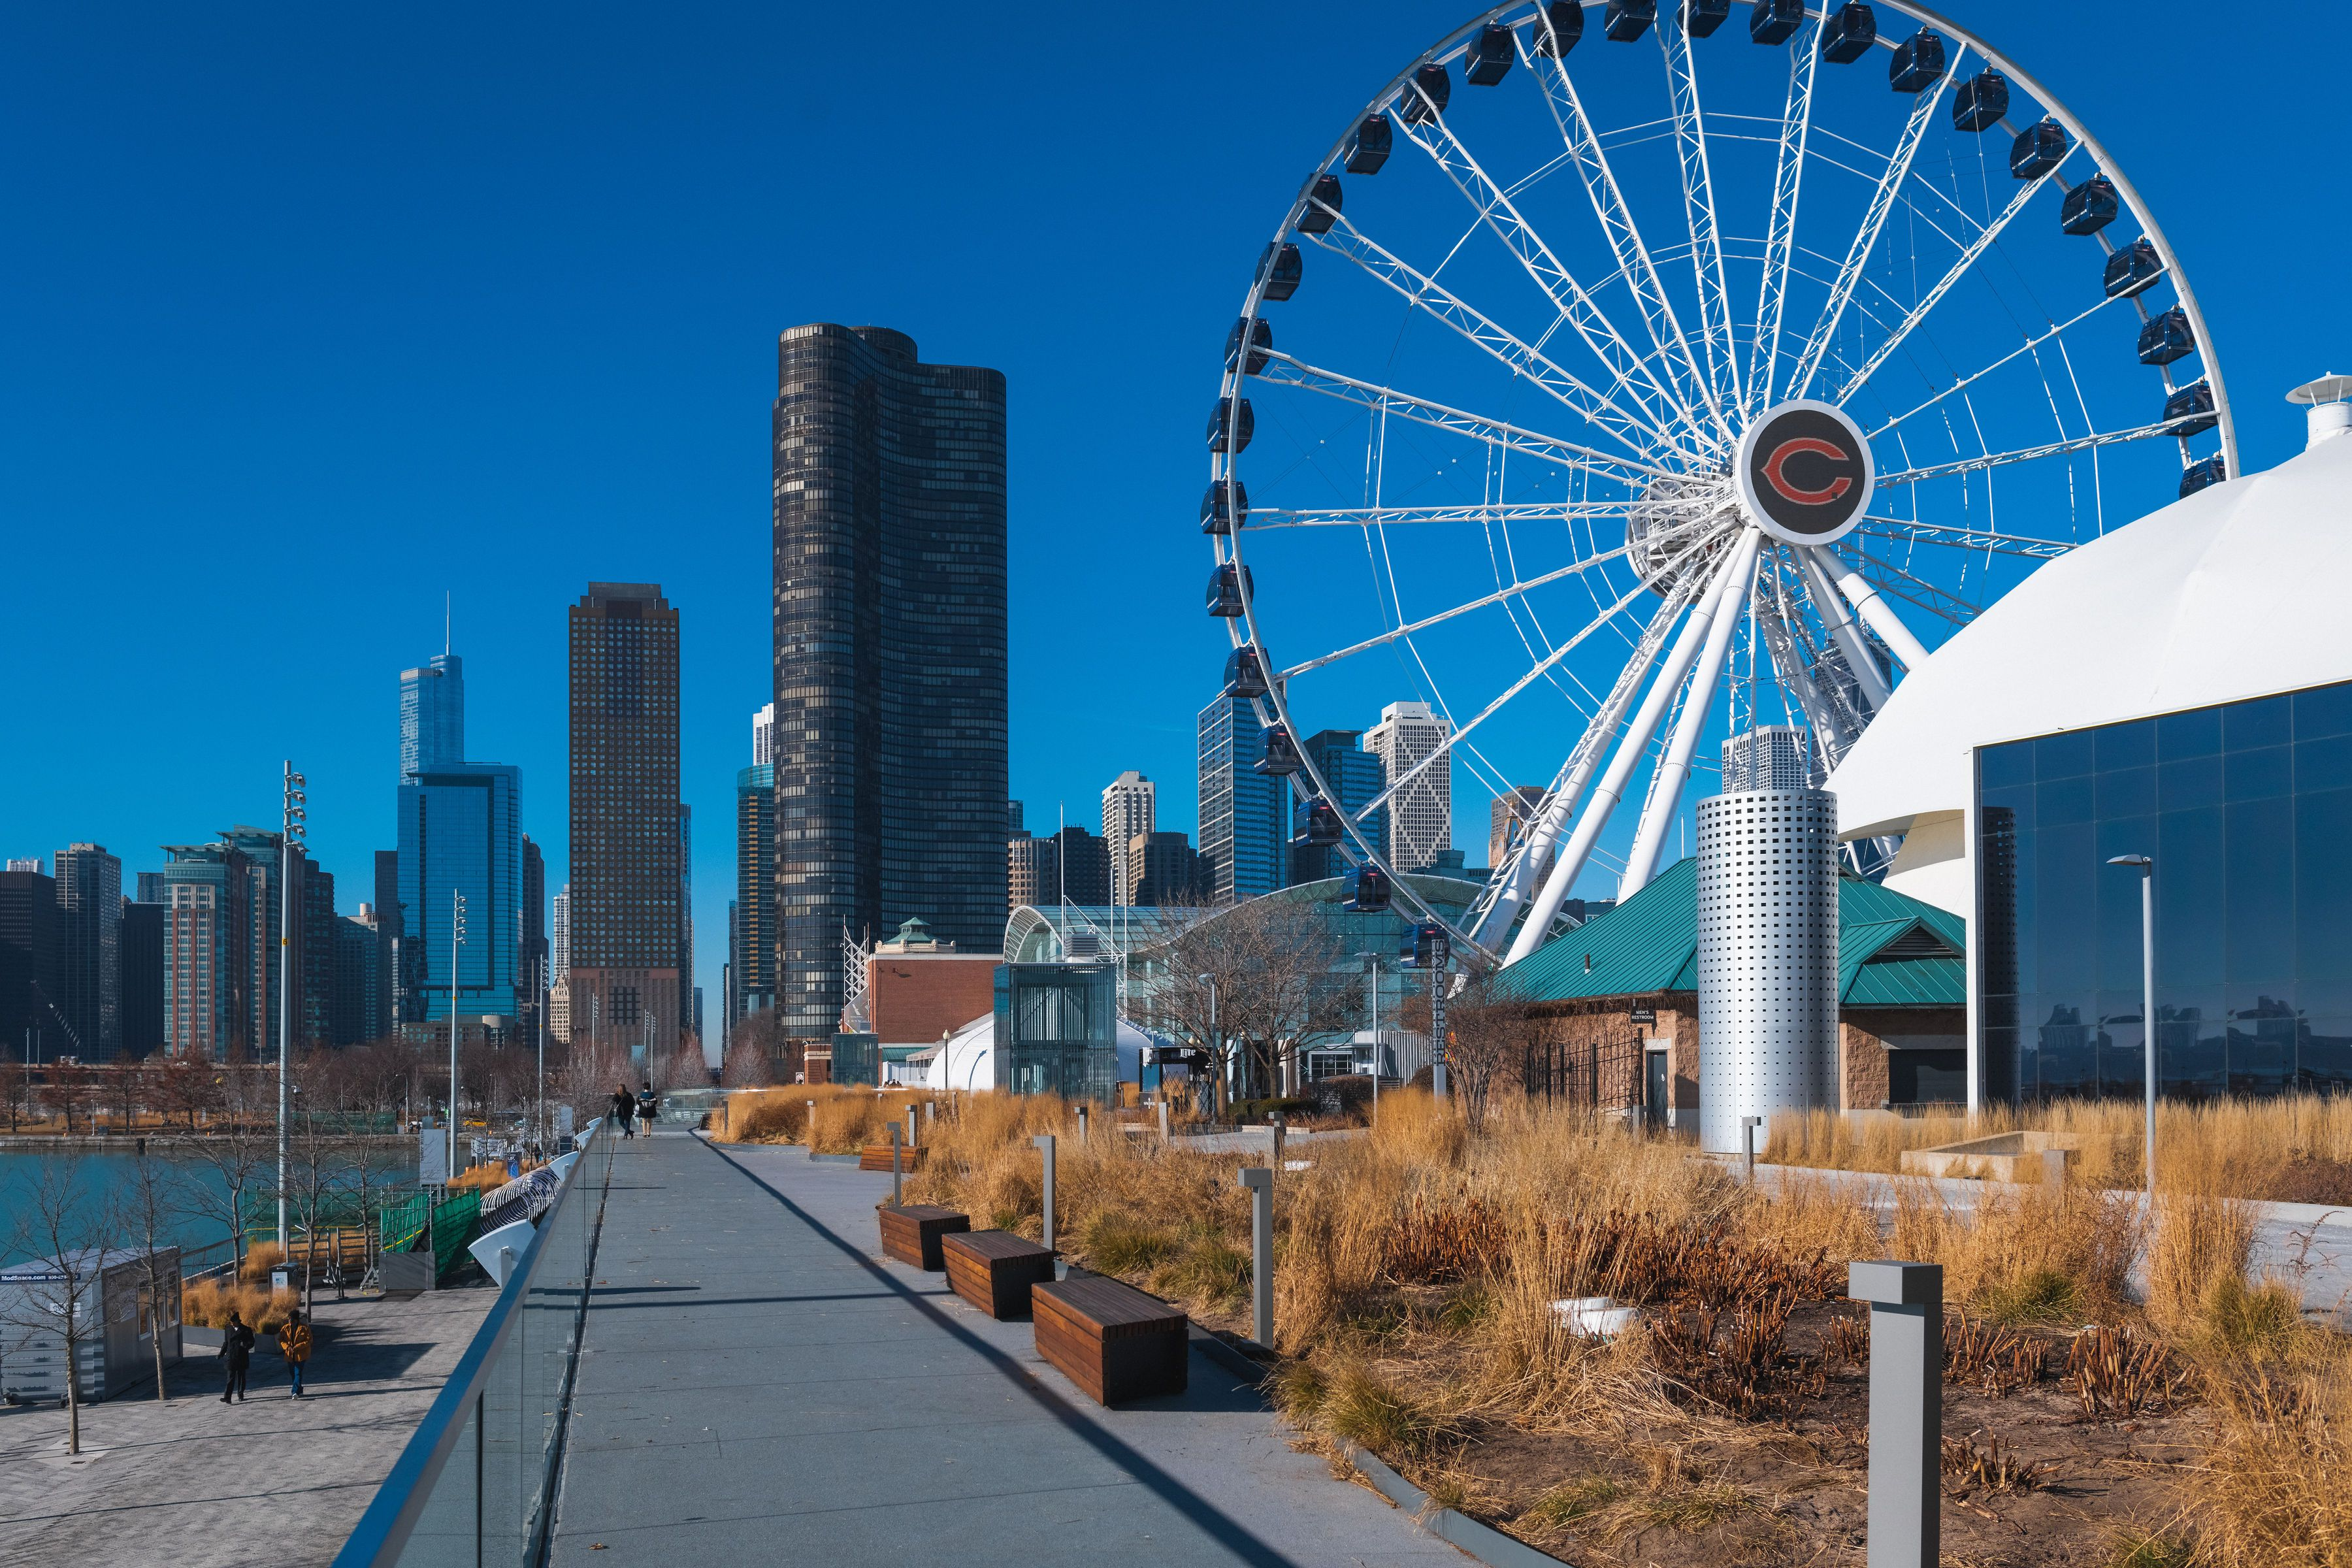 The Ferris Wheel at Chicago's Navy pier